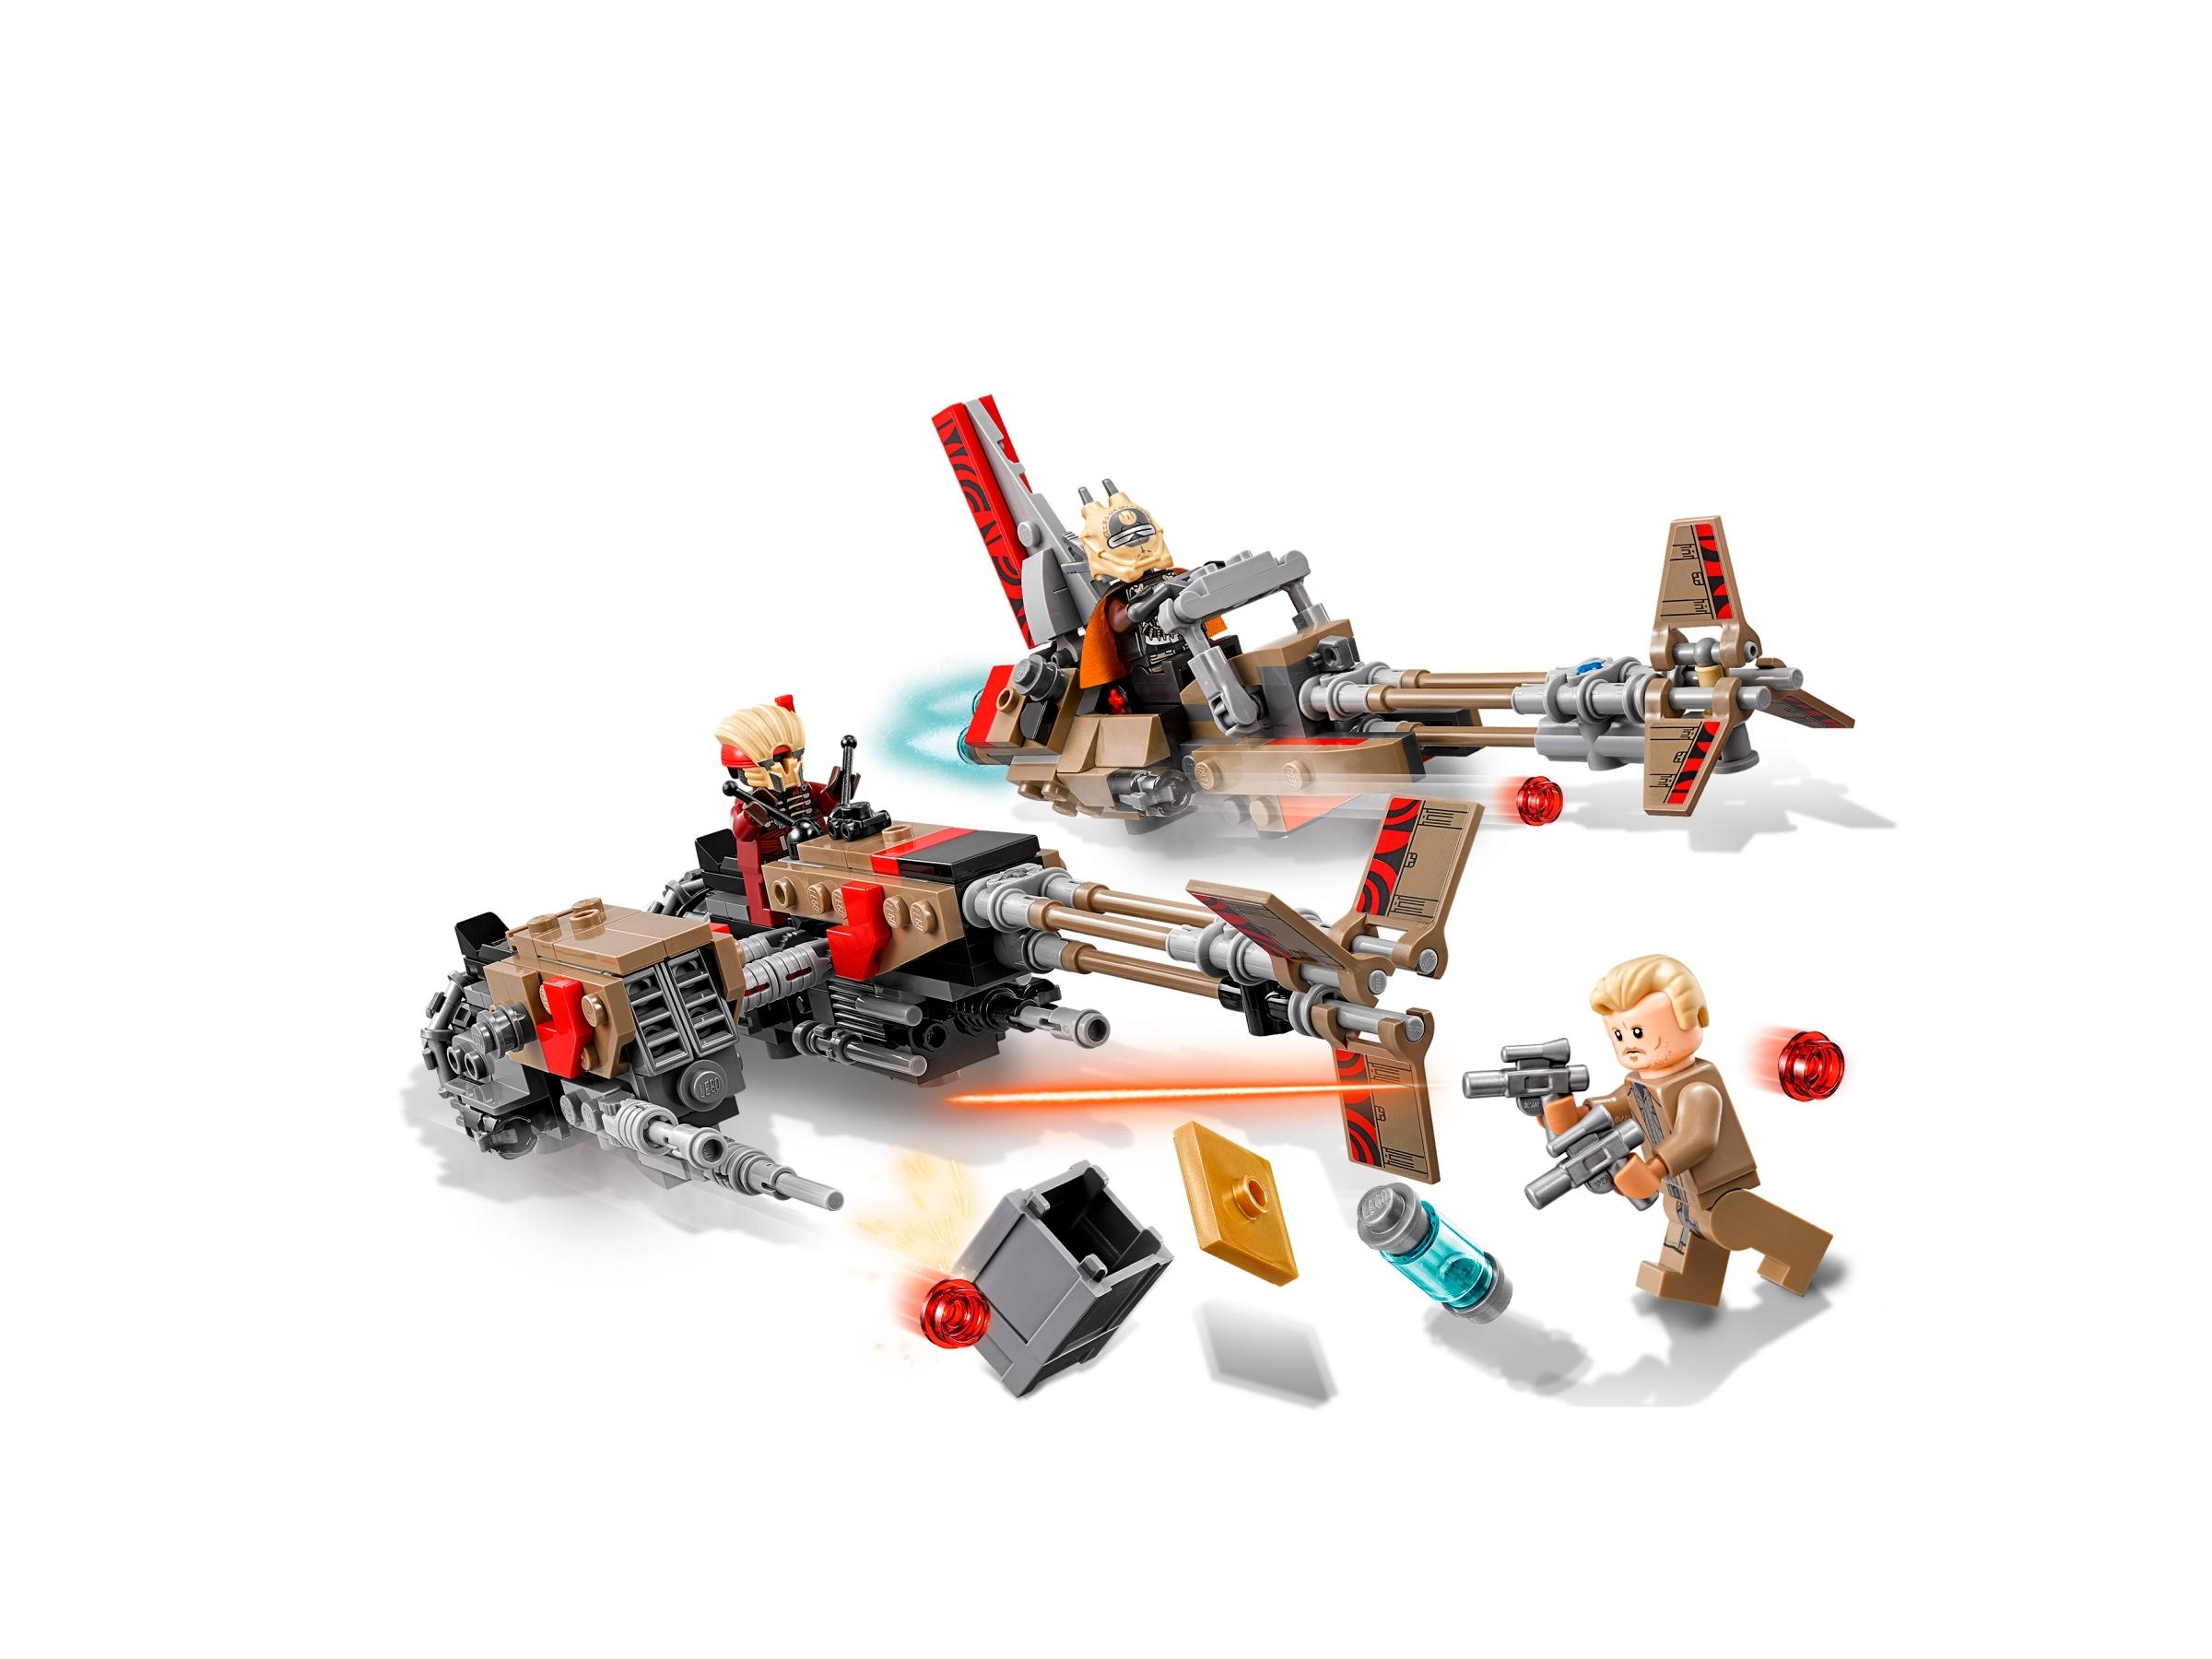 Lego Star Wars Cloud-Rider Swoop Bikes #75215